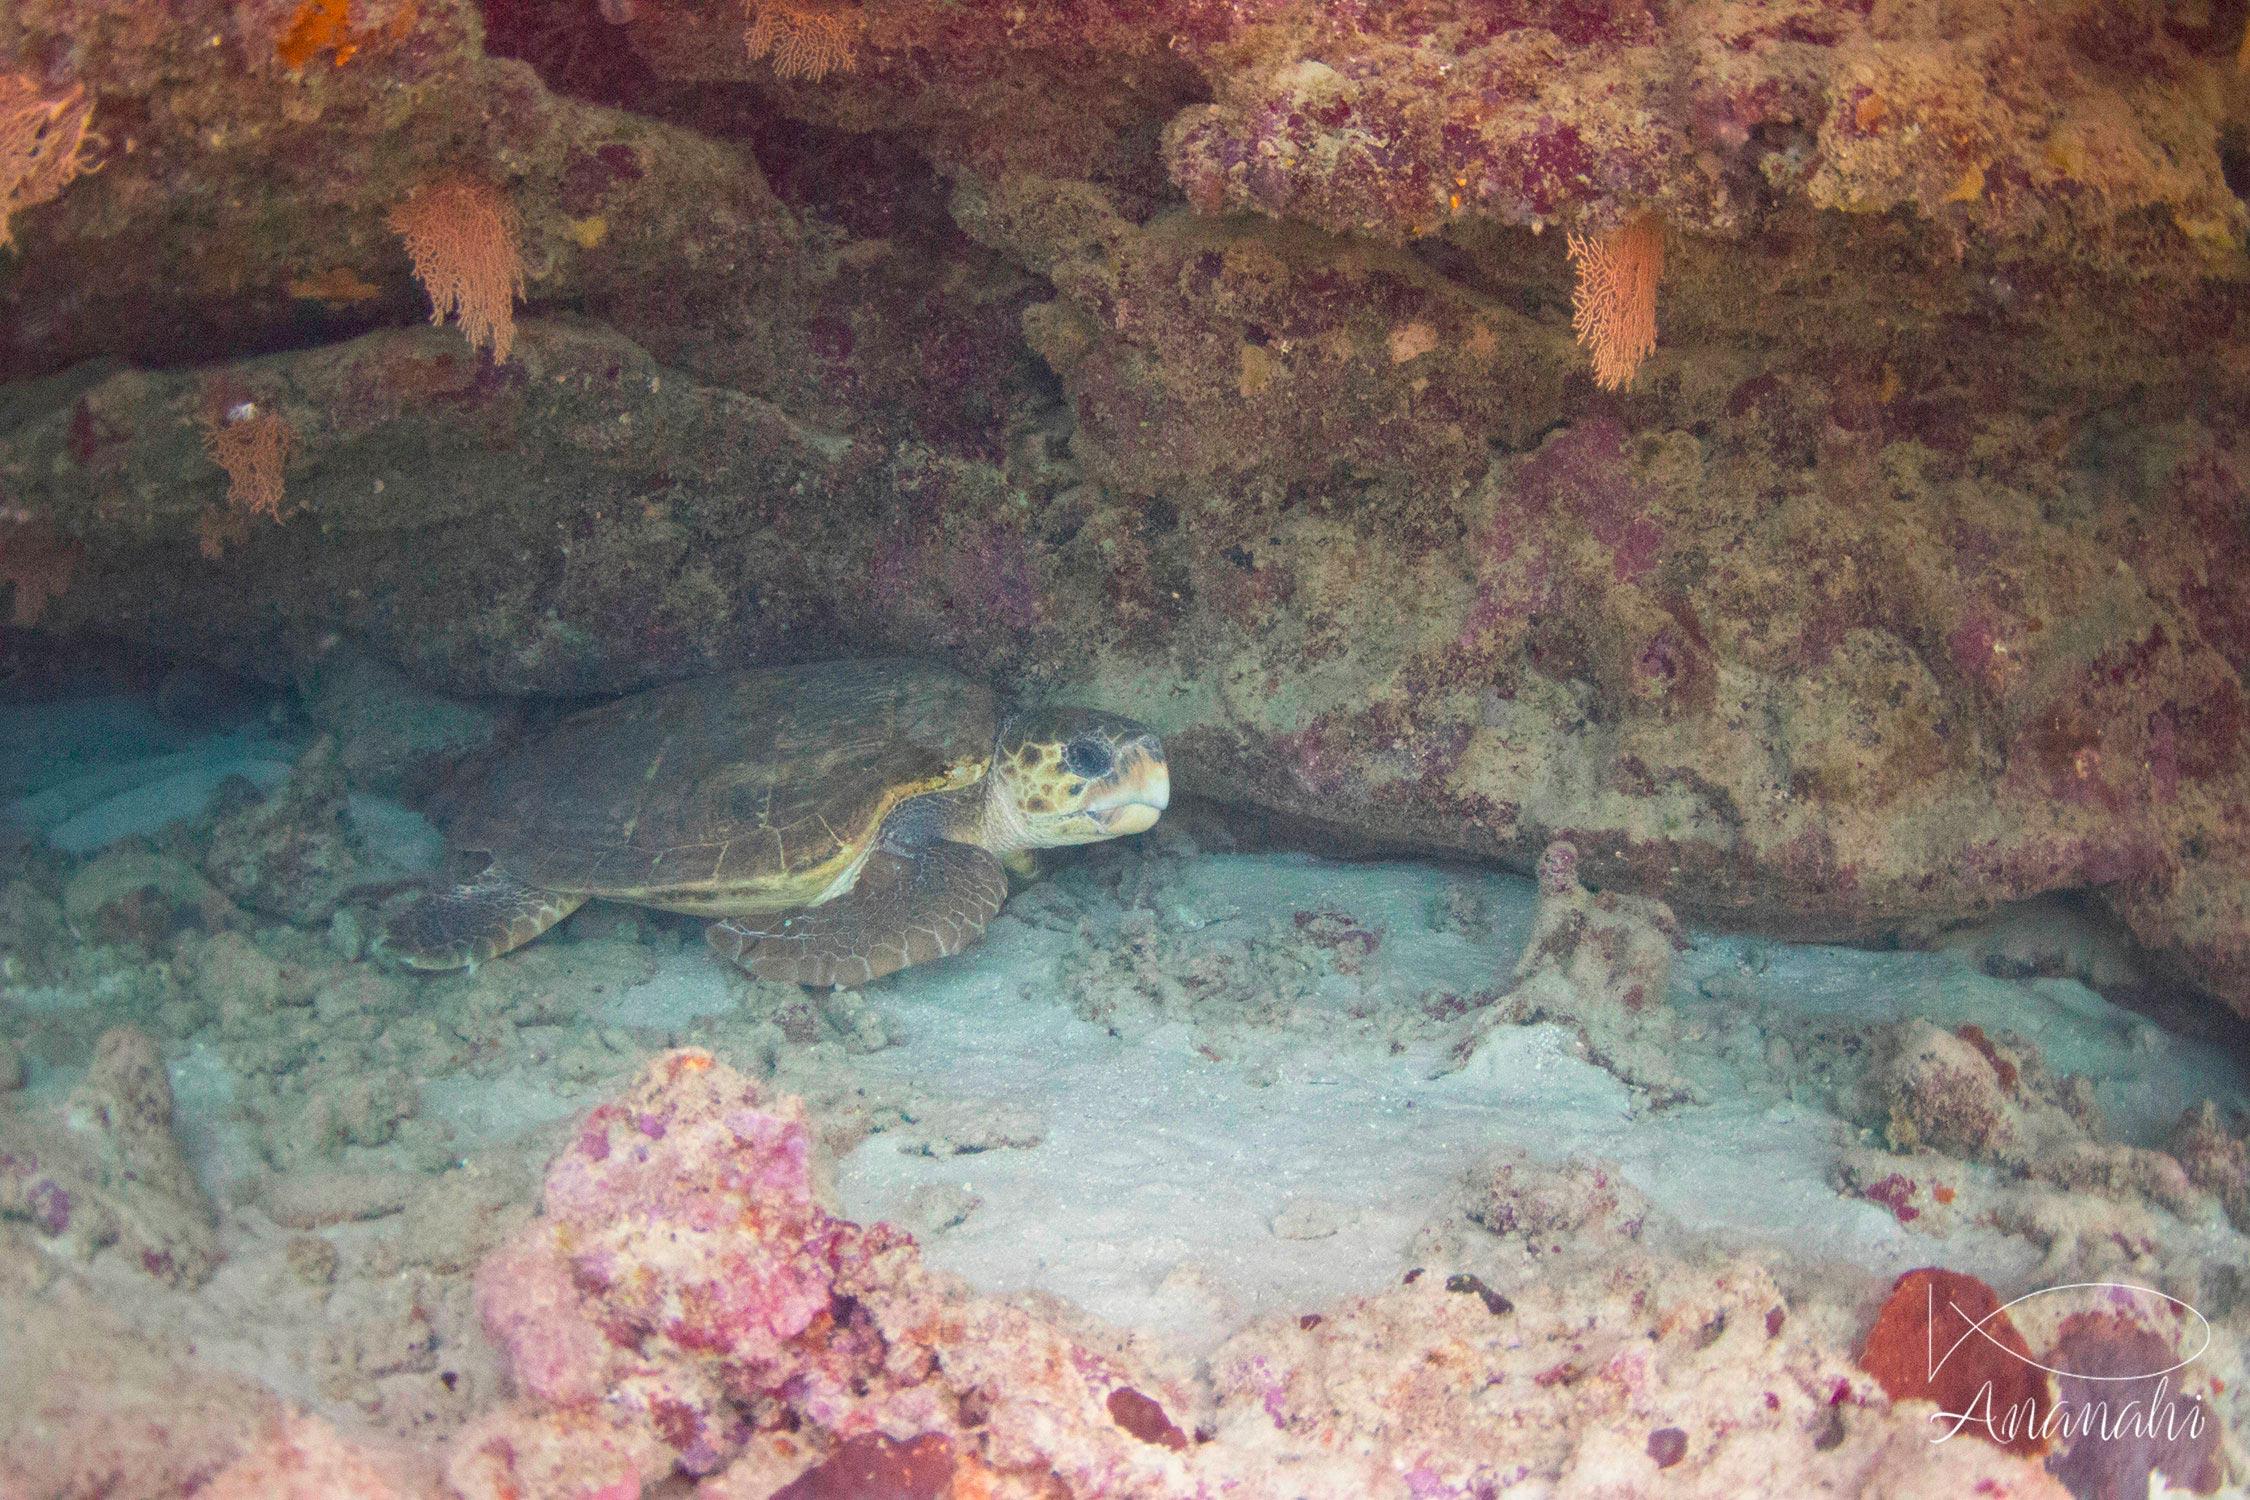 Tortue caouanne de Mayotte